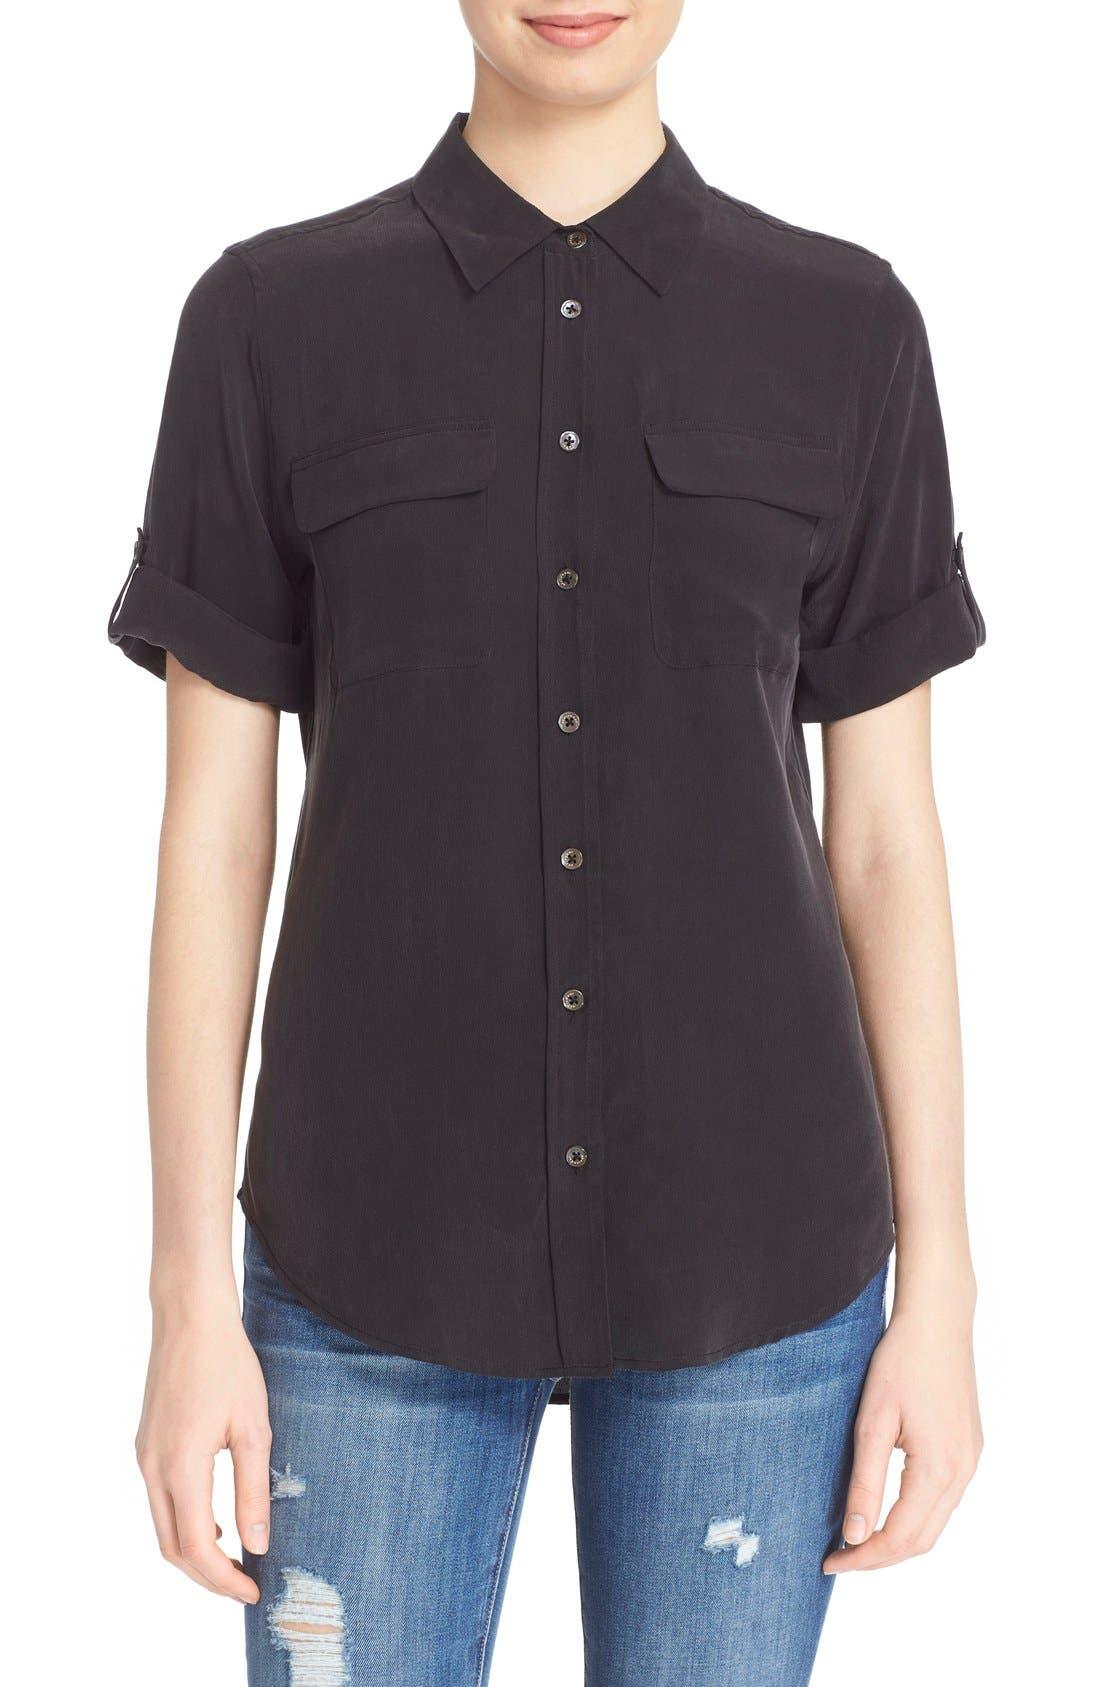 Alternate Image 1 Selected - Equipment Slim Signature Short Sleeve Silk Shirt